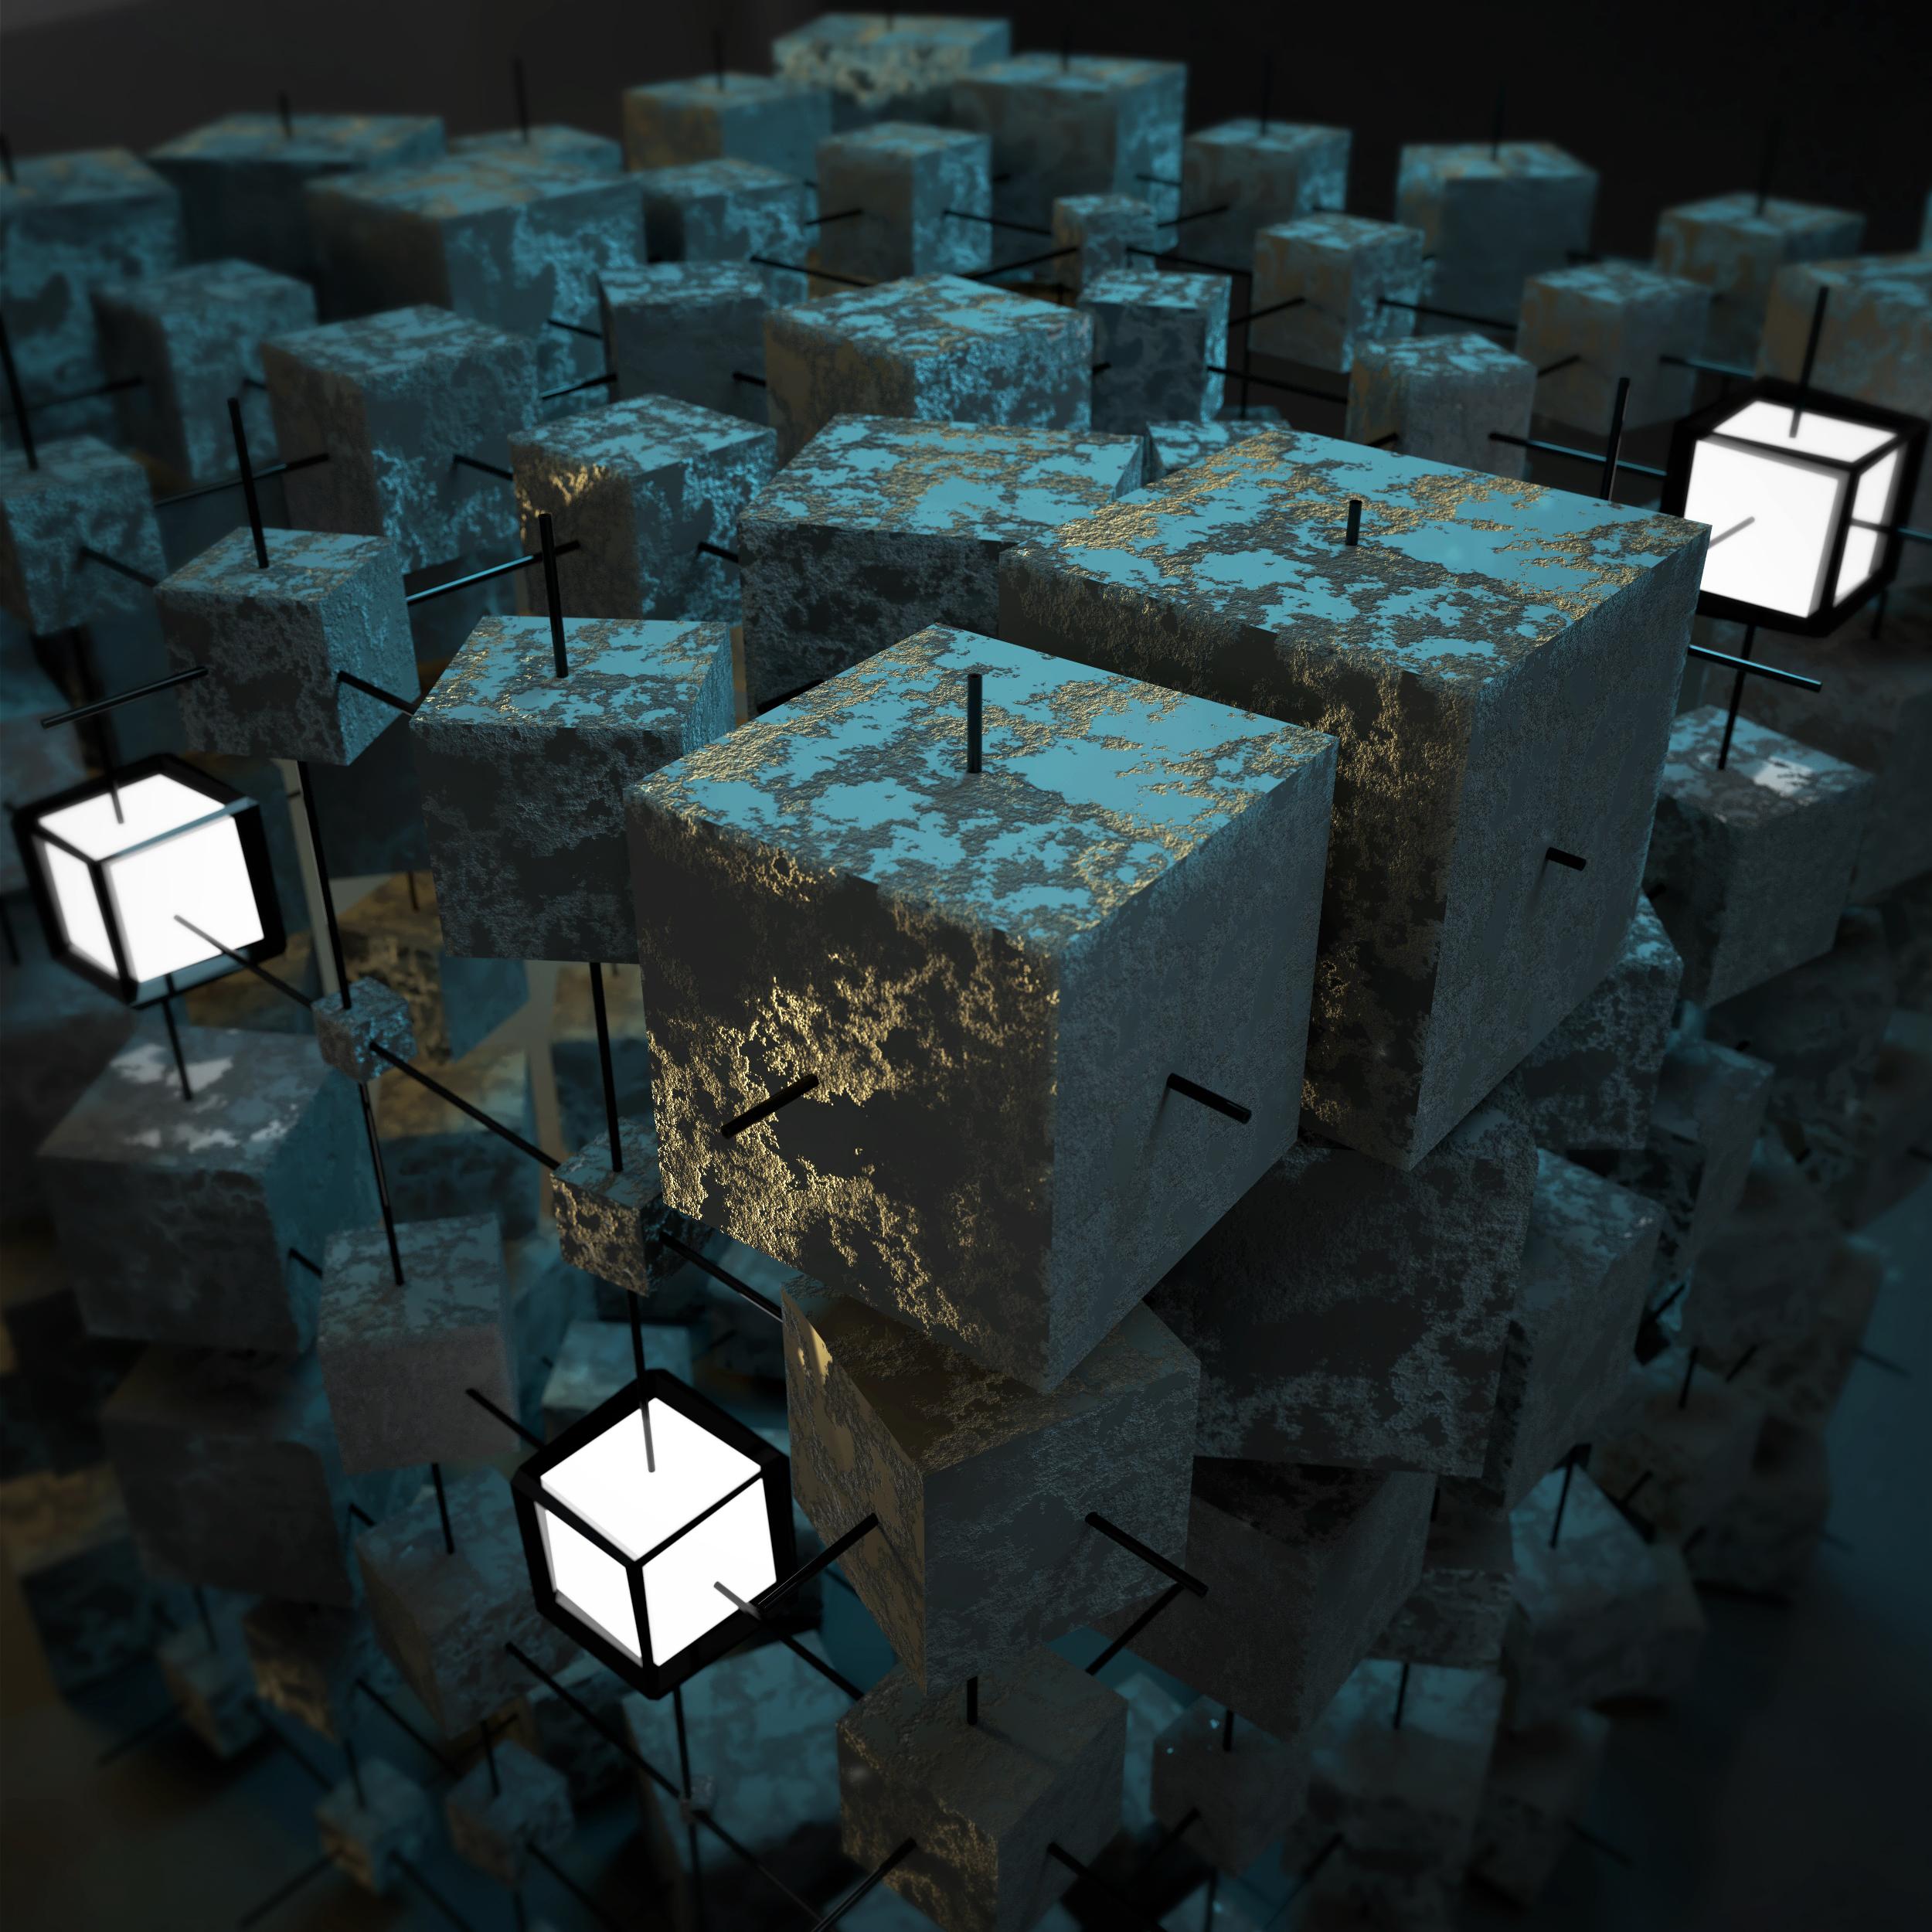 Cubes in motion - Rahul Girish